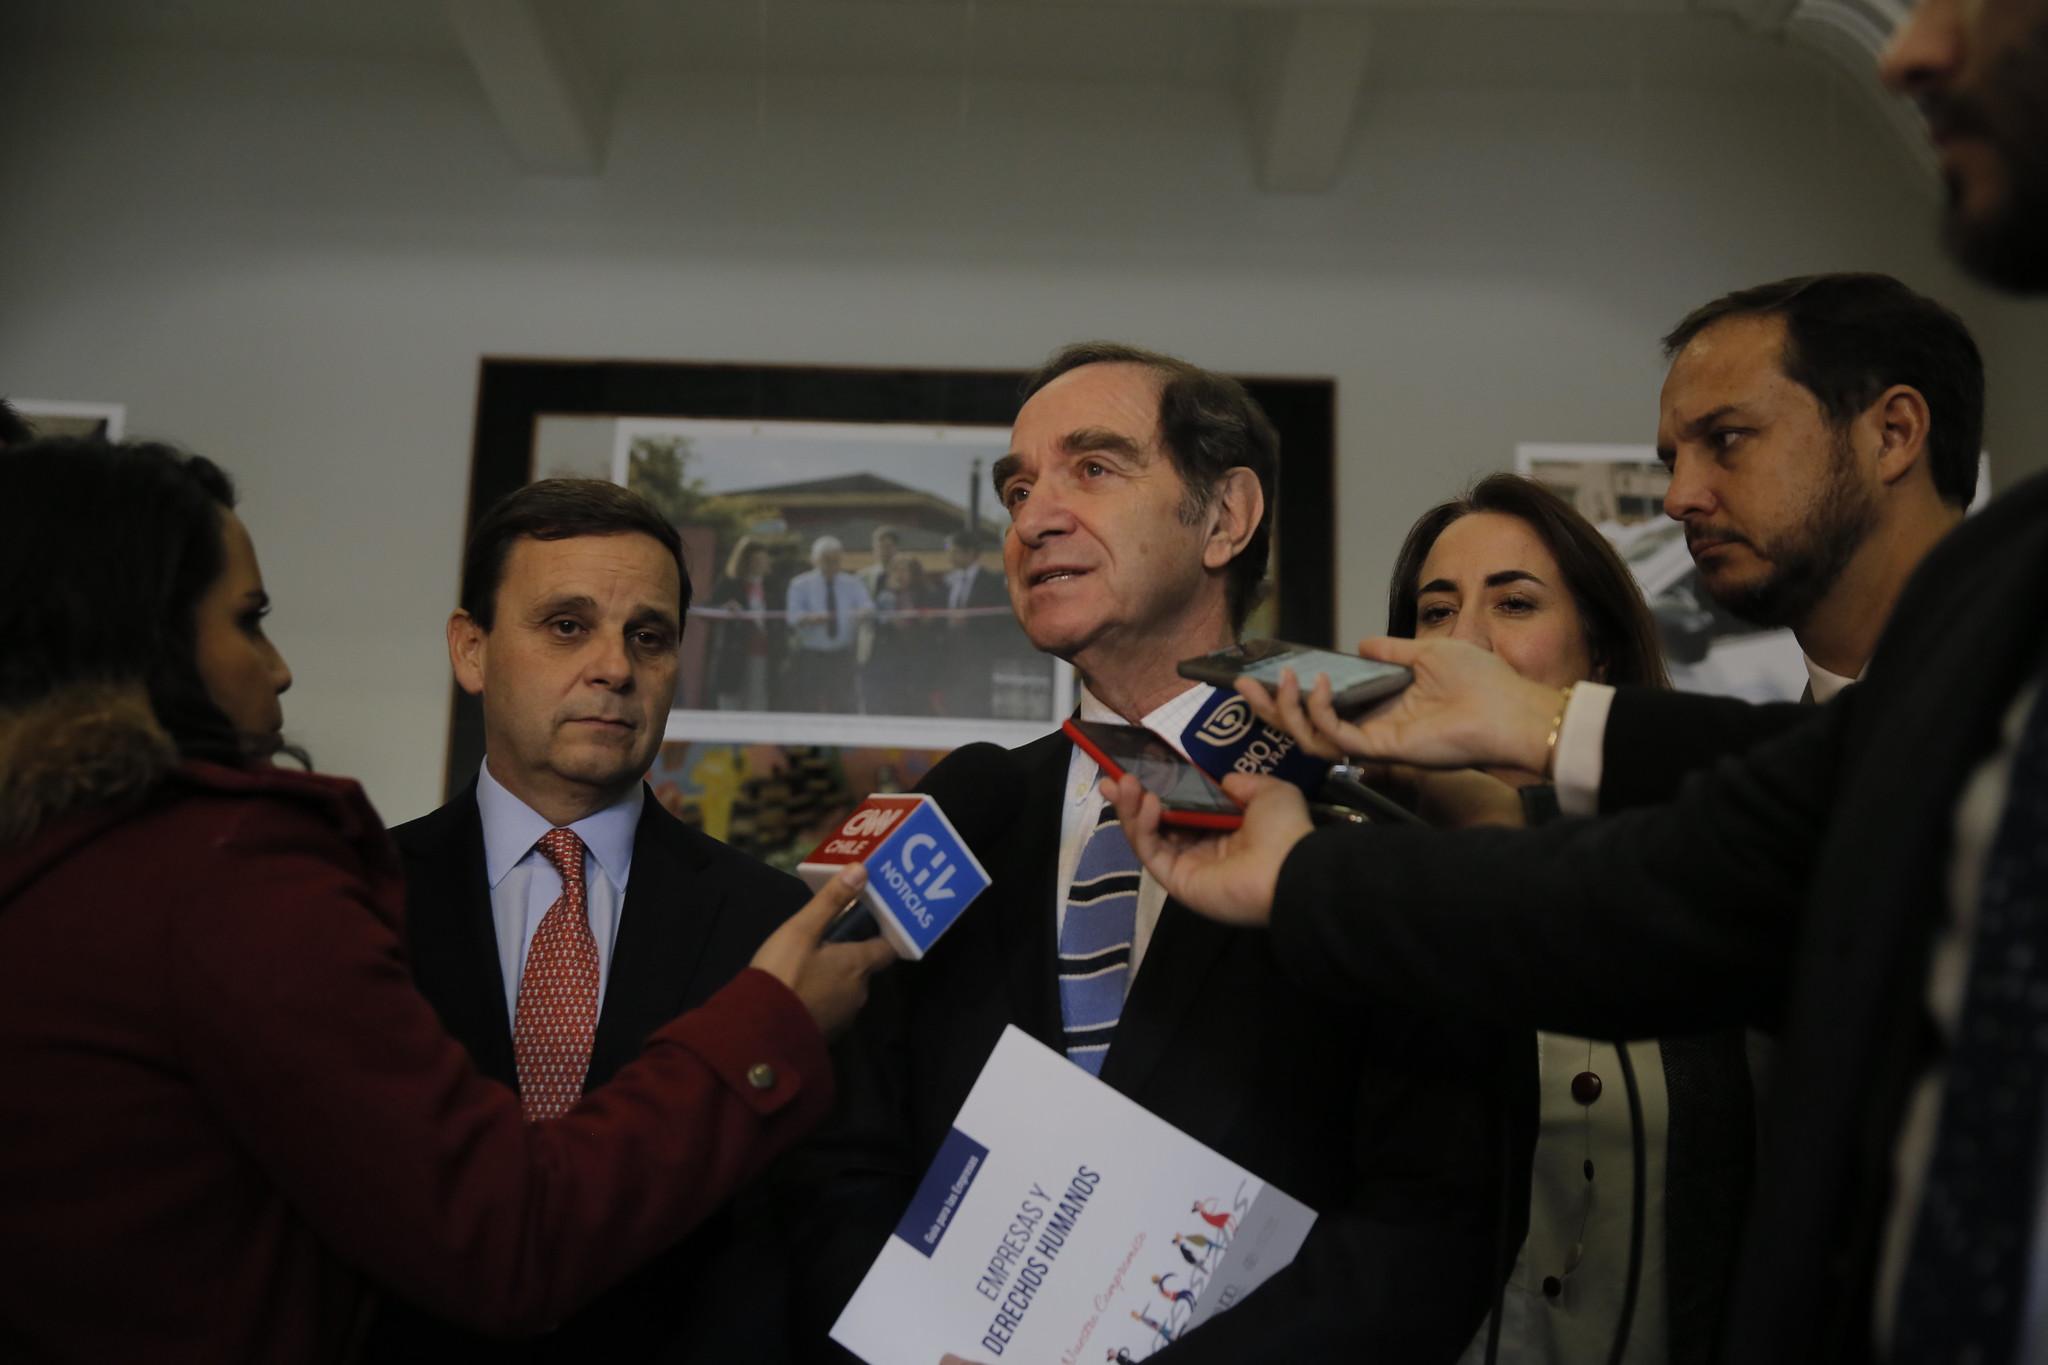 Adopción homoparental: Movilh acusa a ministro Larraín de «persistente homofobia»